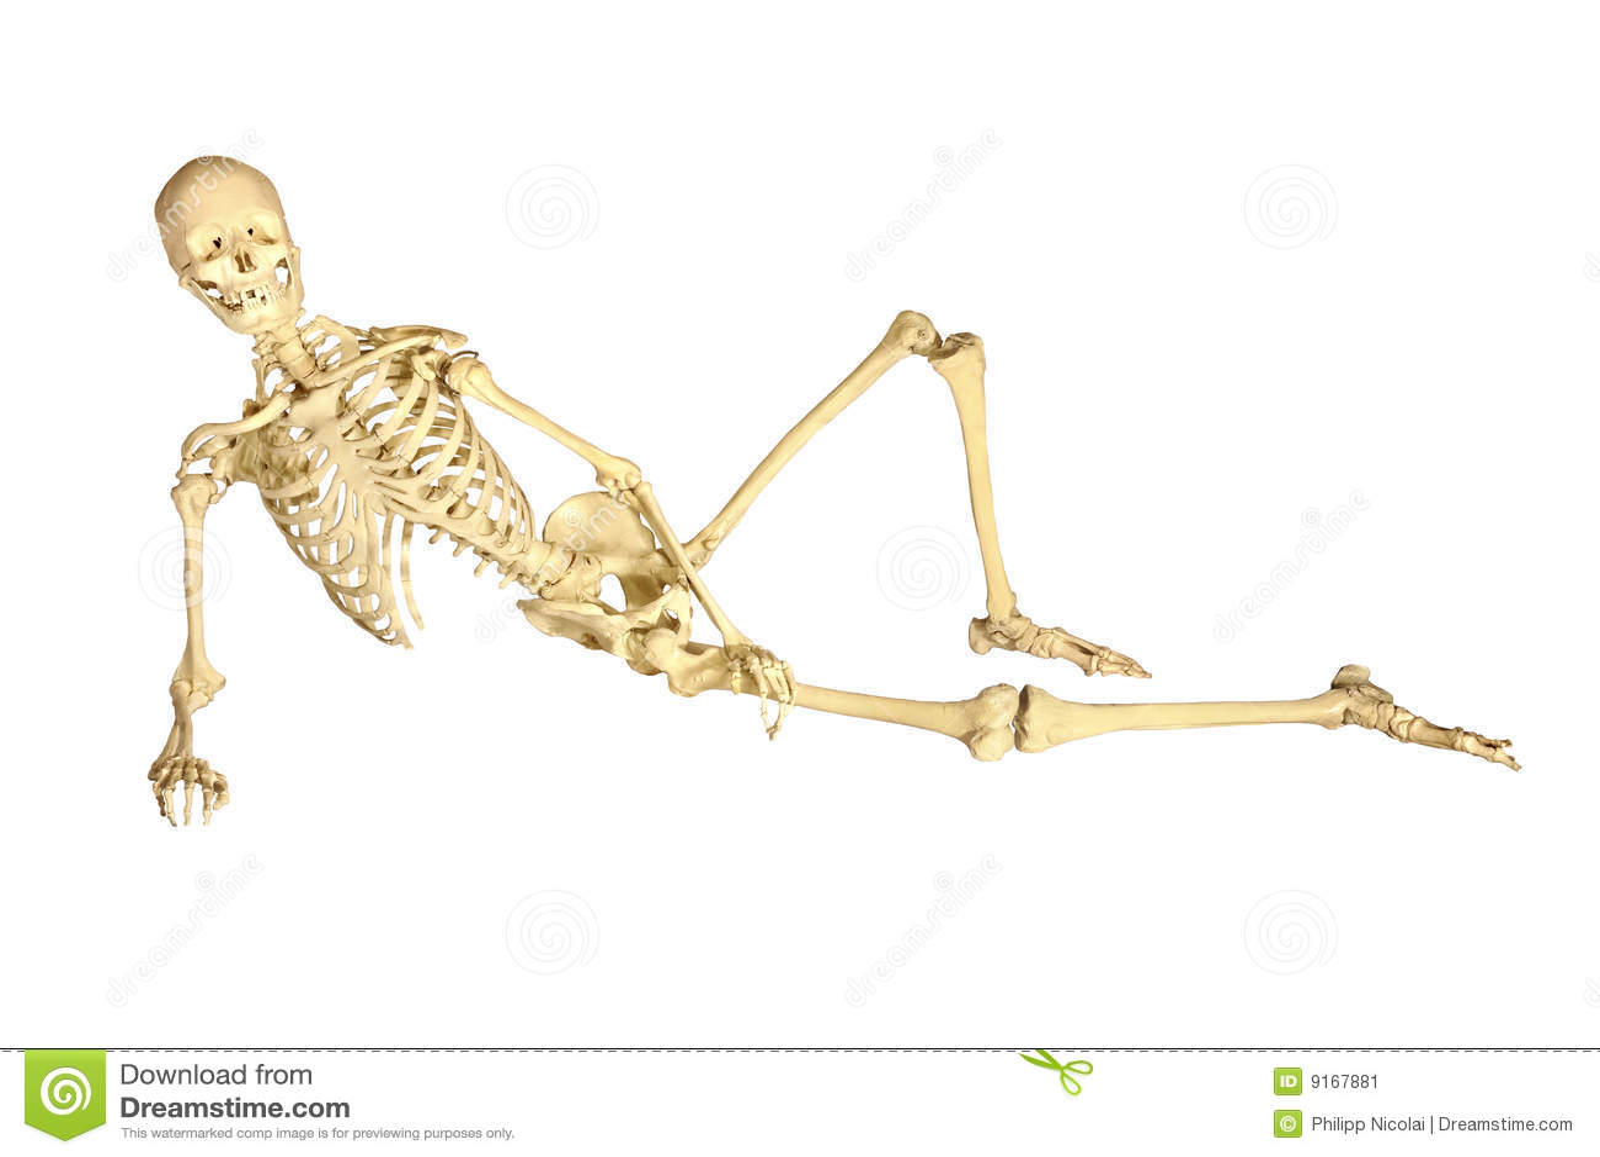 Секс с скелетами 16 фотография